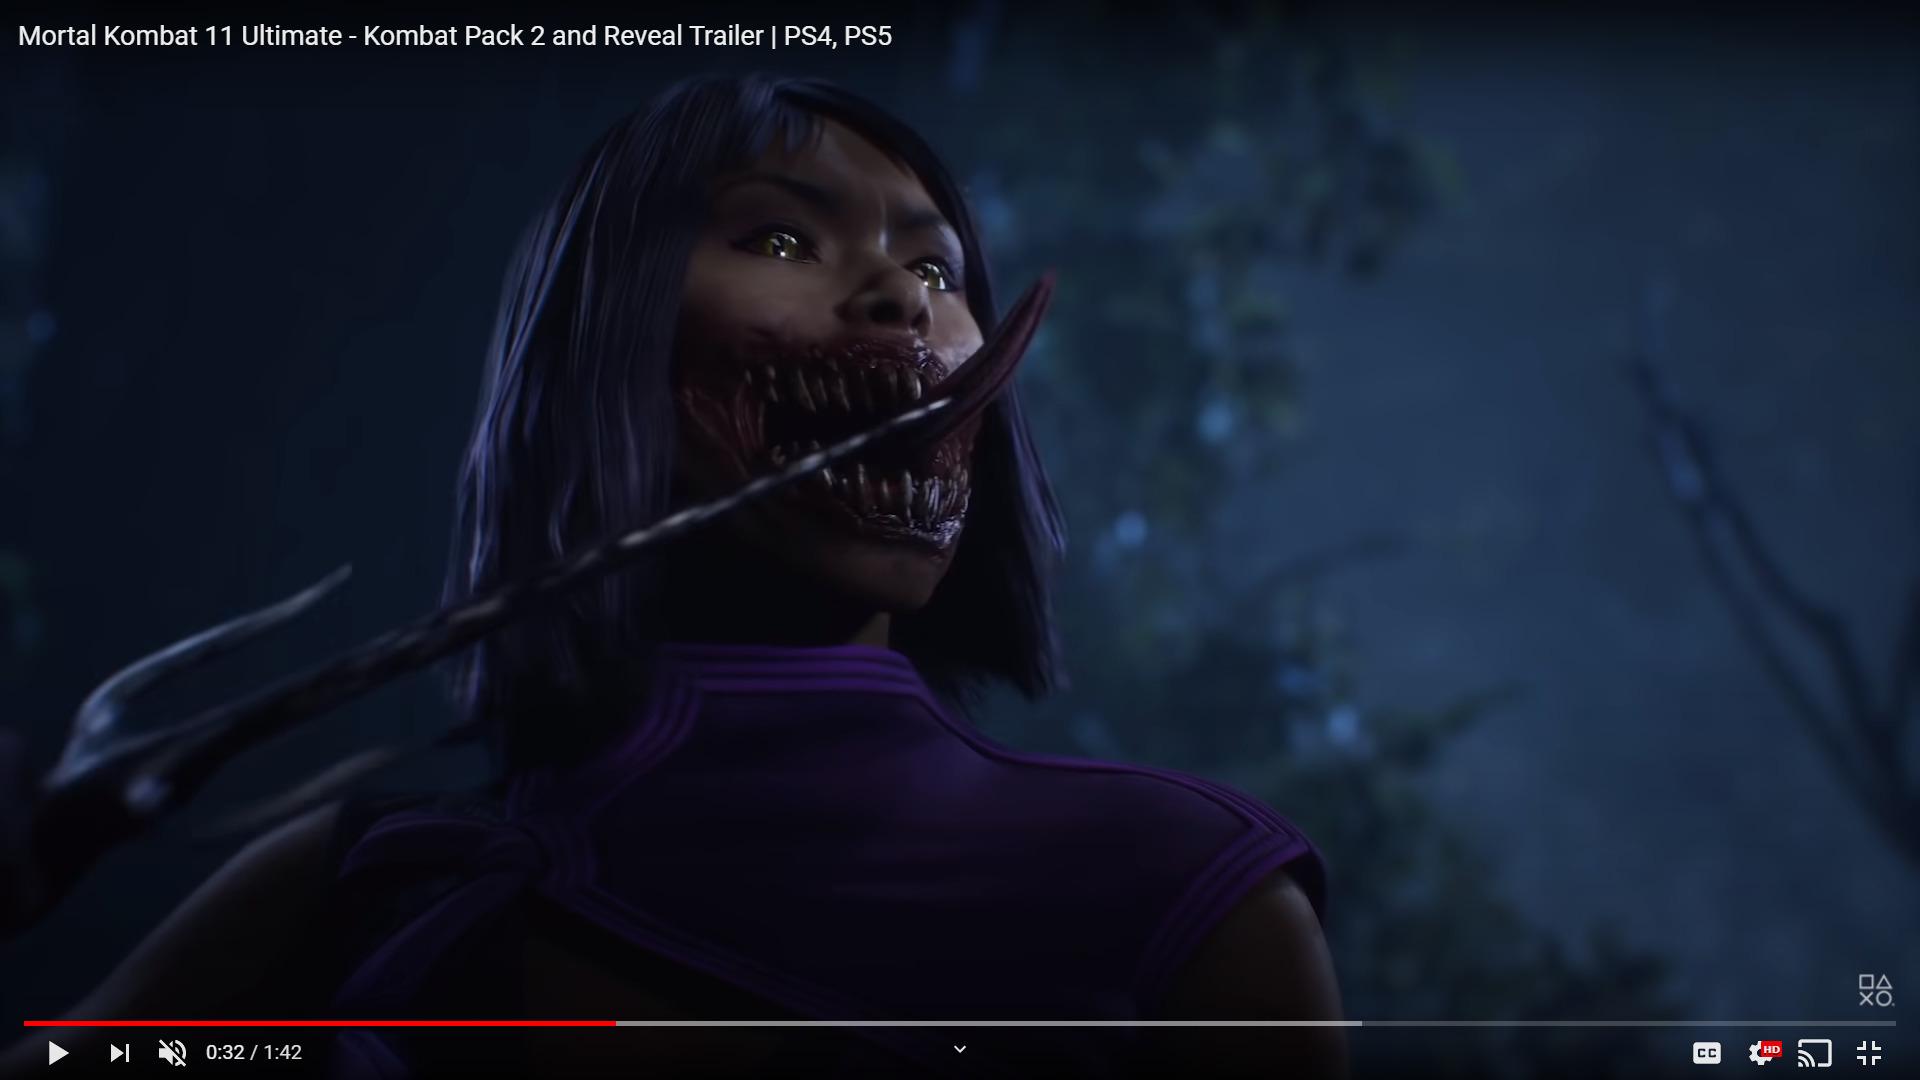 Mortal Kombat 11 Is Finally Adding Mileena To The Playable Character List